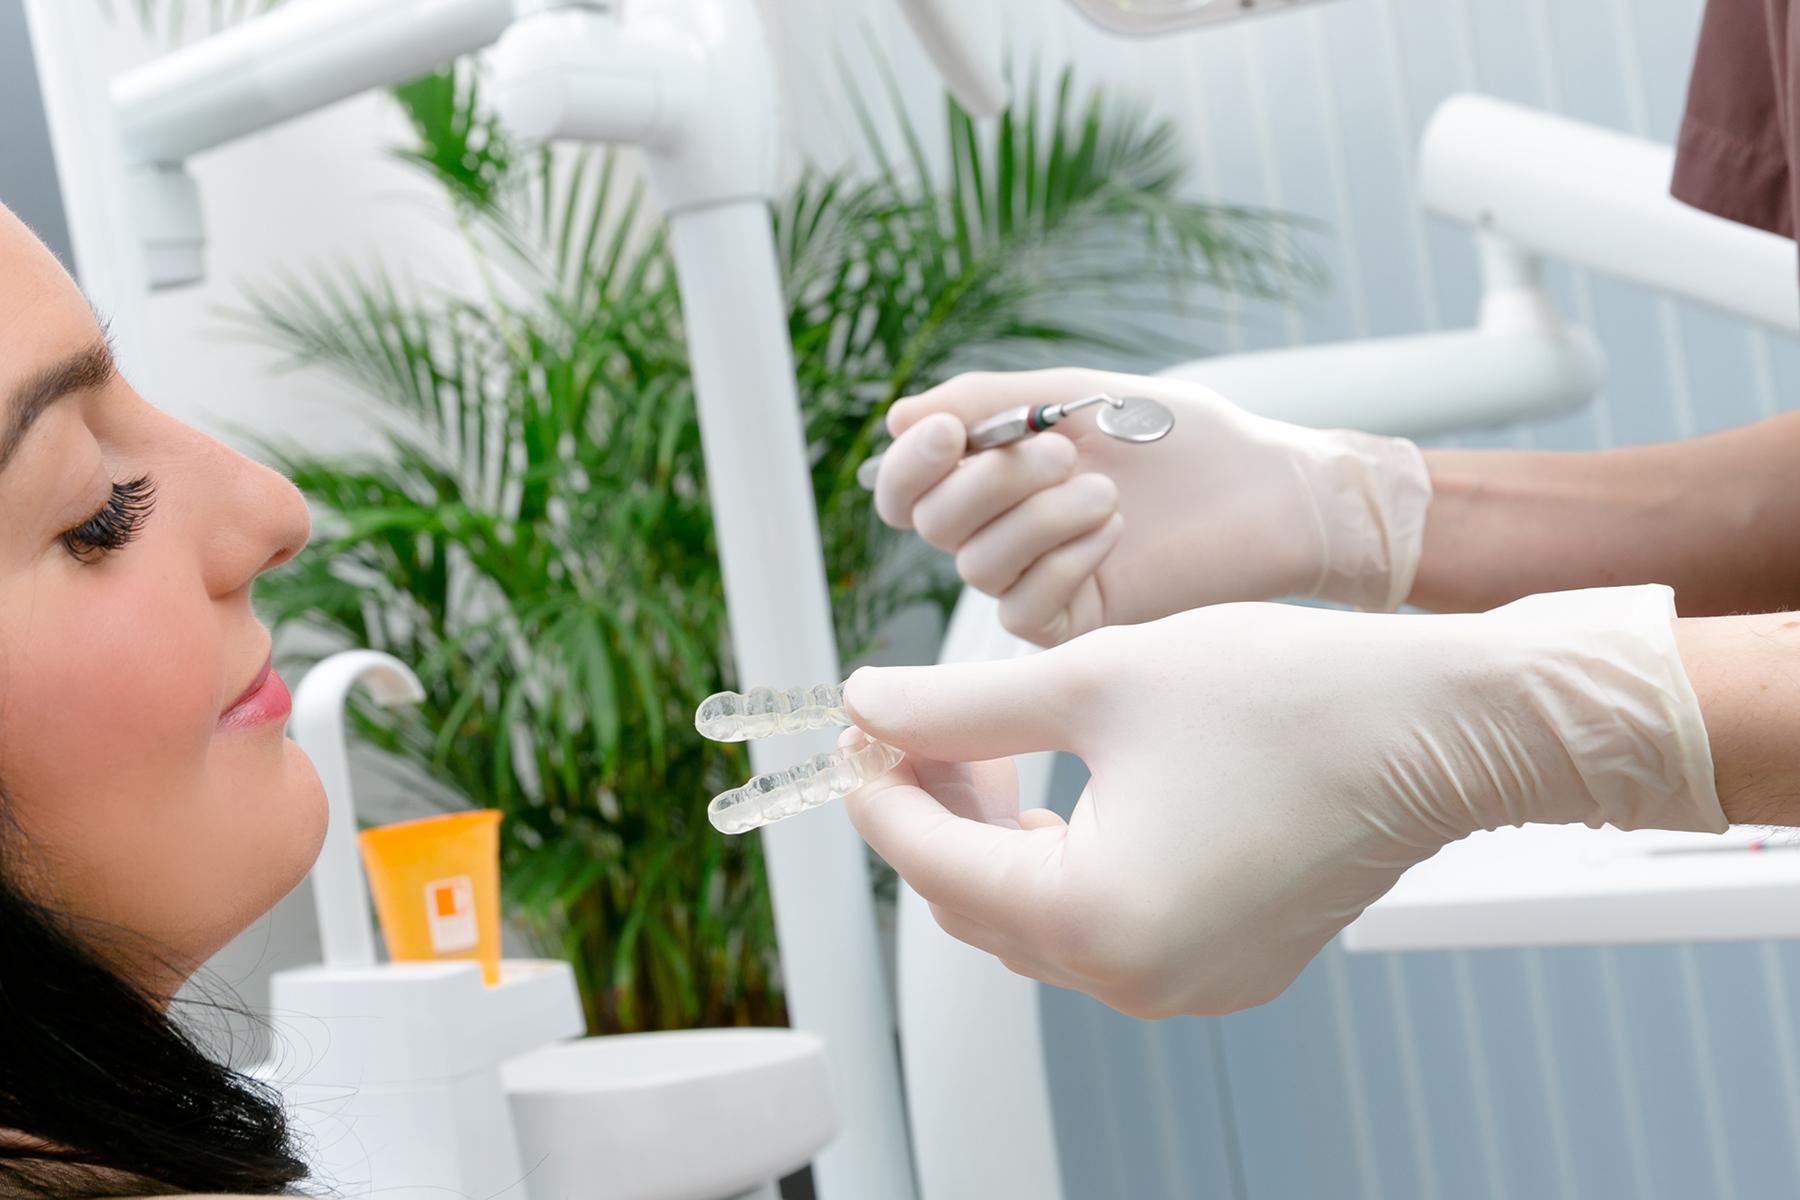 Carree Dental Kieferorthopädie Schiene